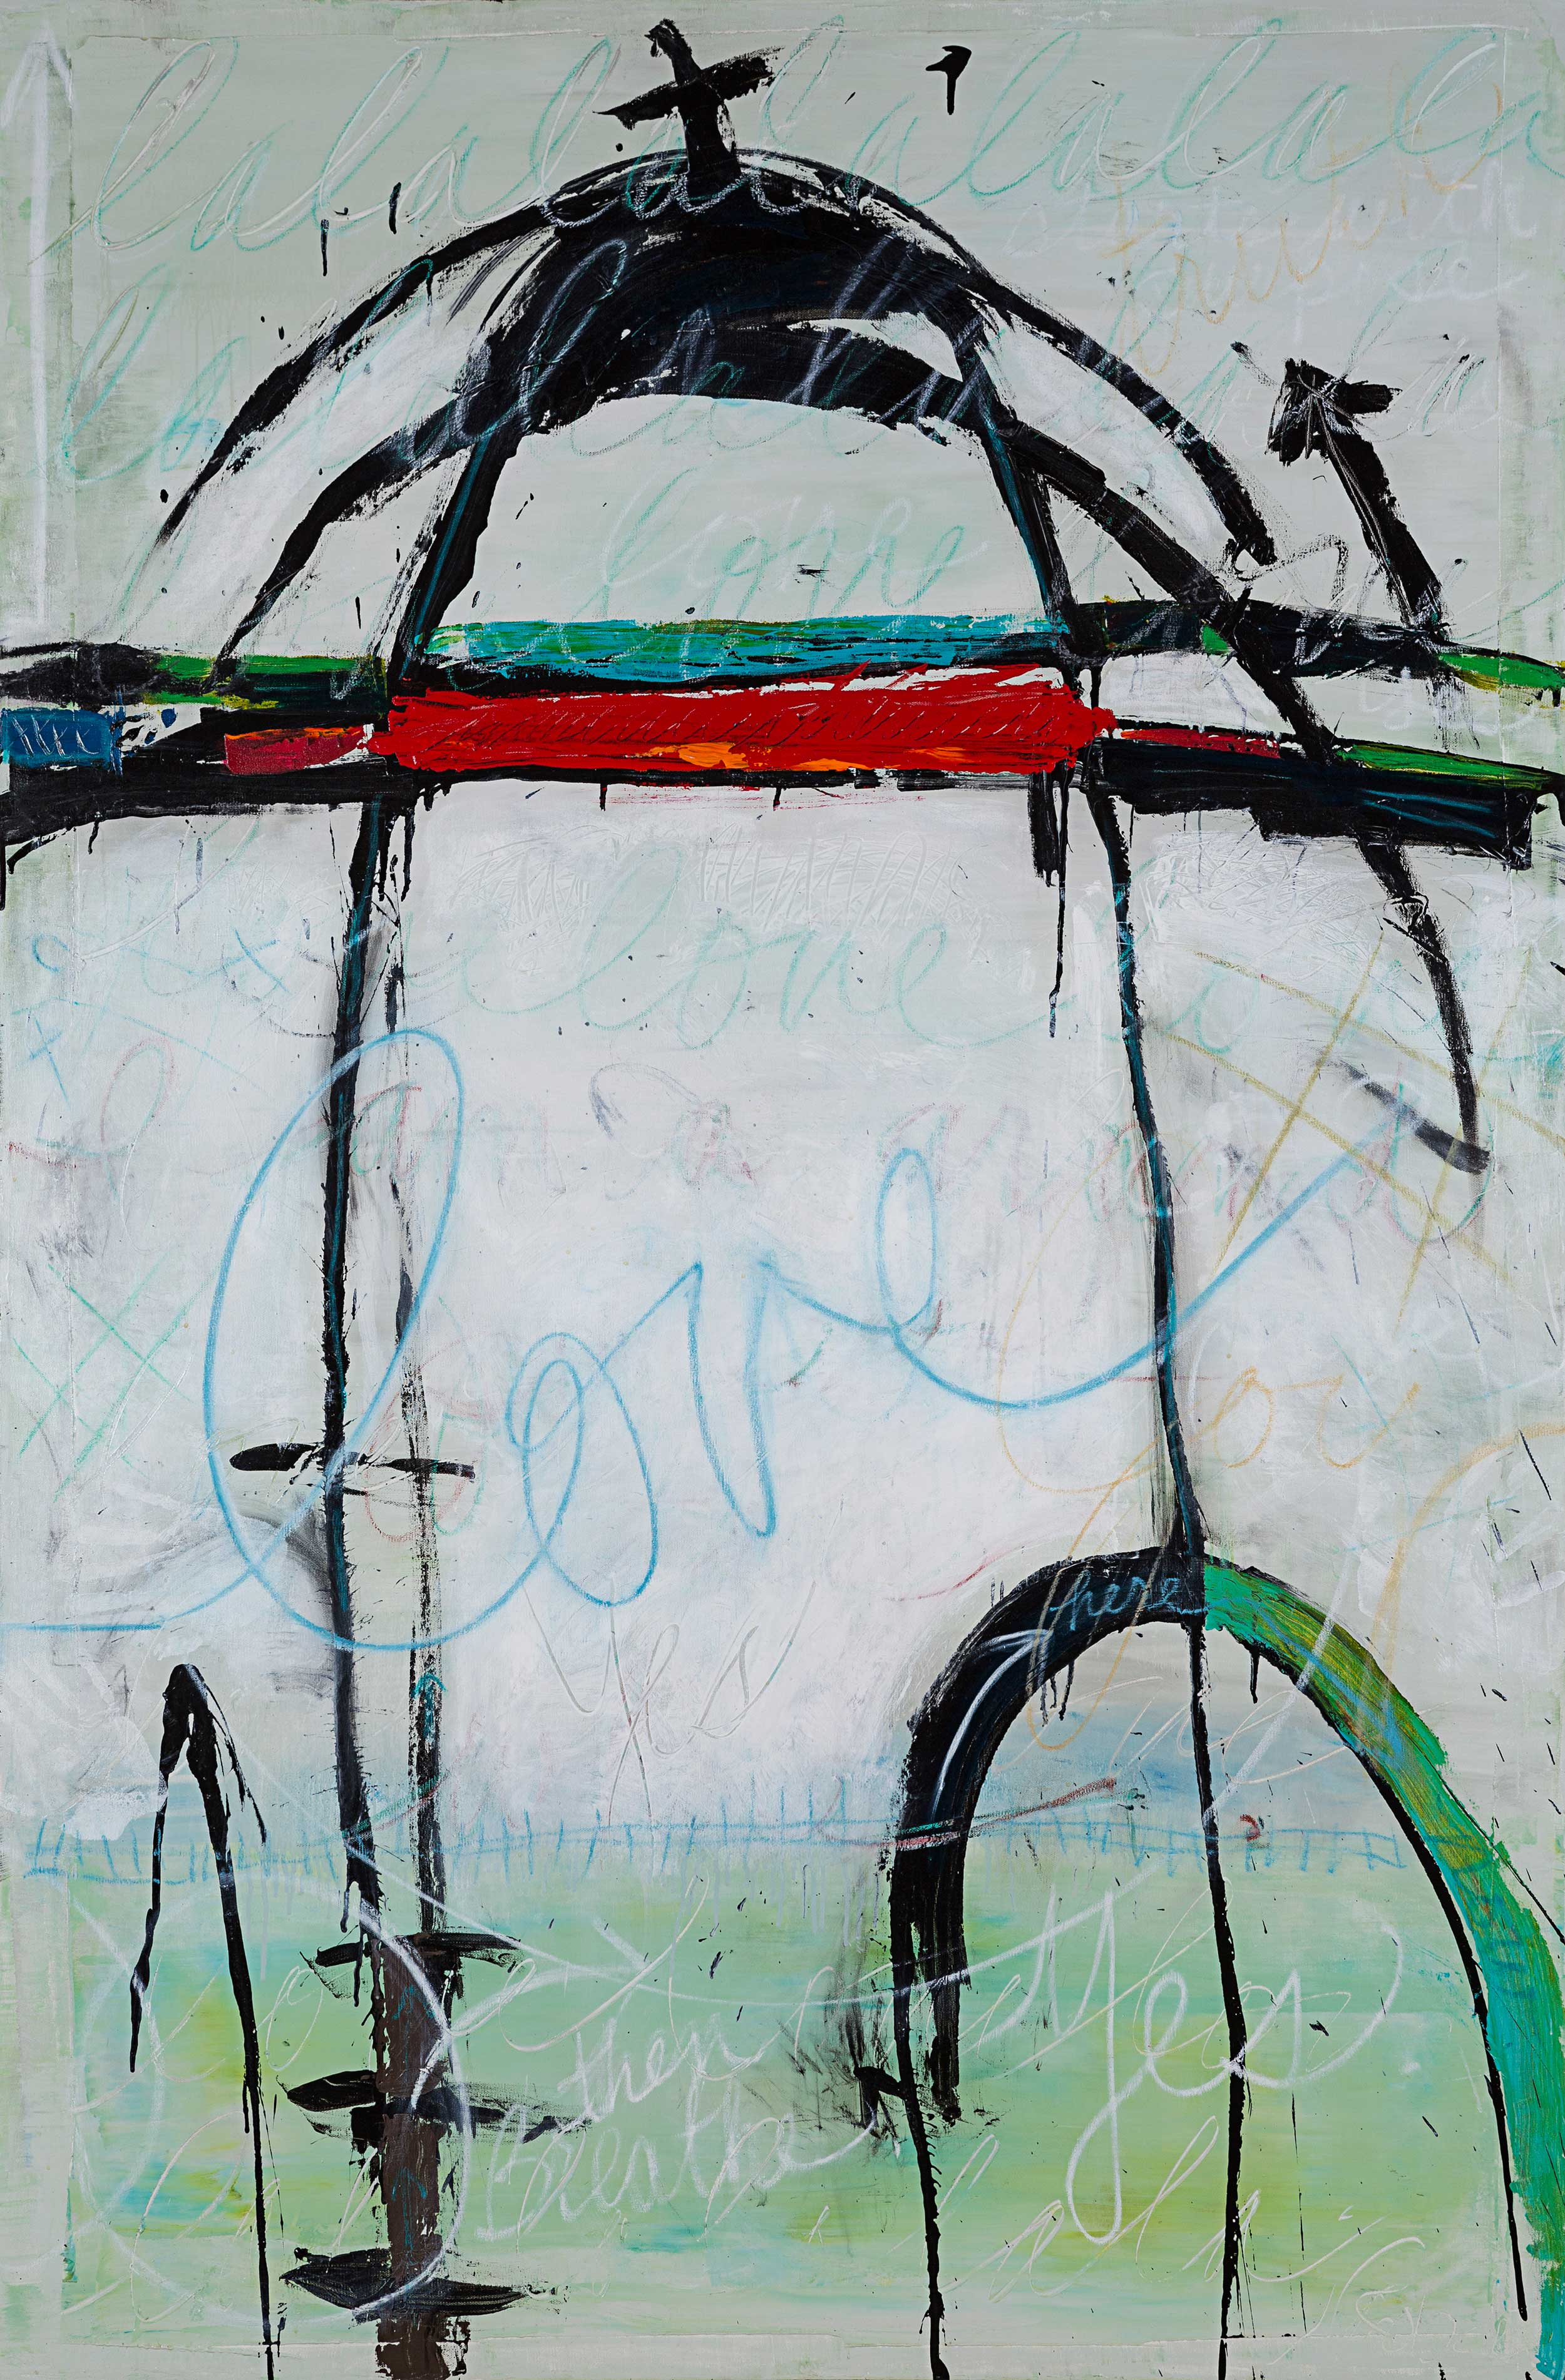 Janet-Roberts-Loves-Totem-Kelly-Lebrock 48x72.jpg